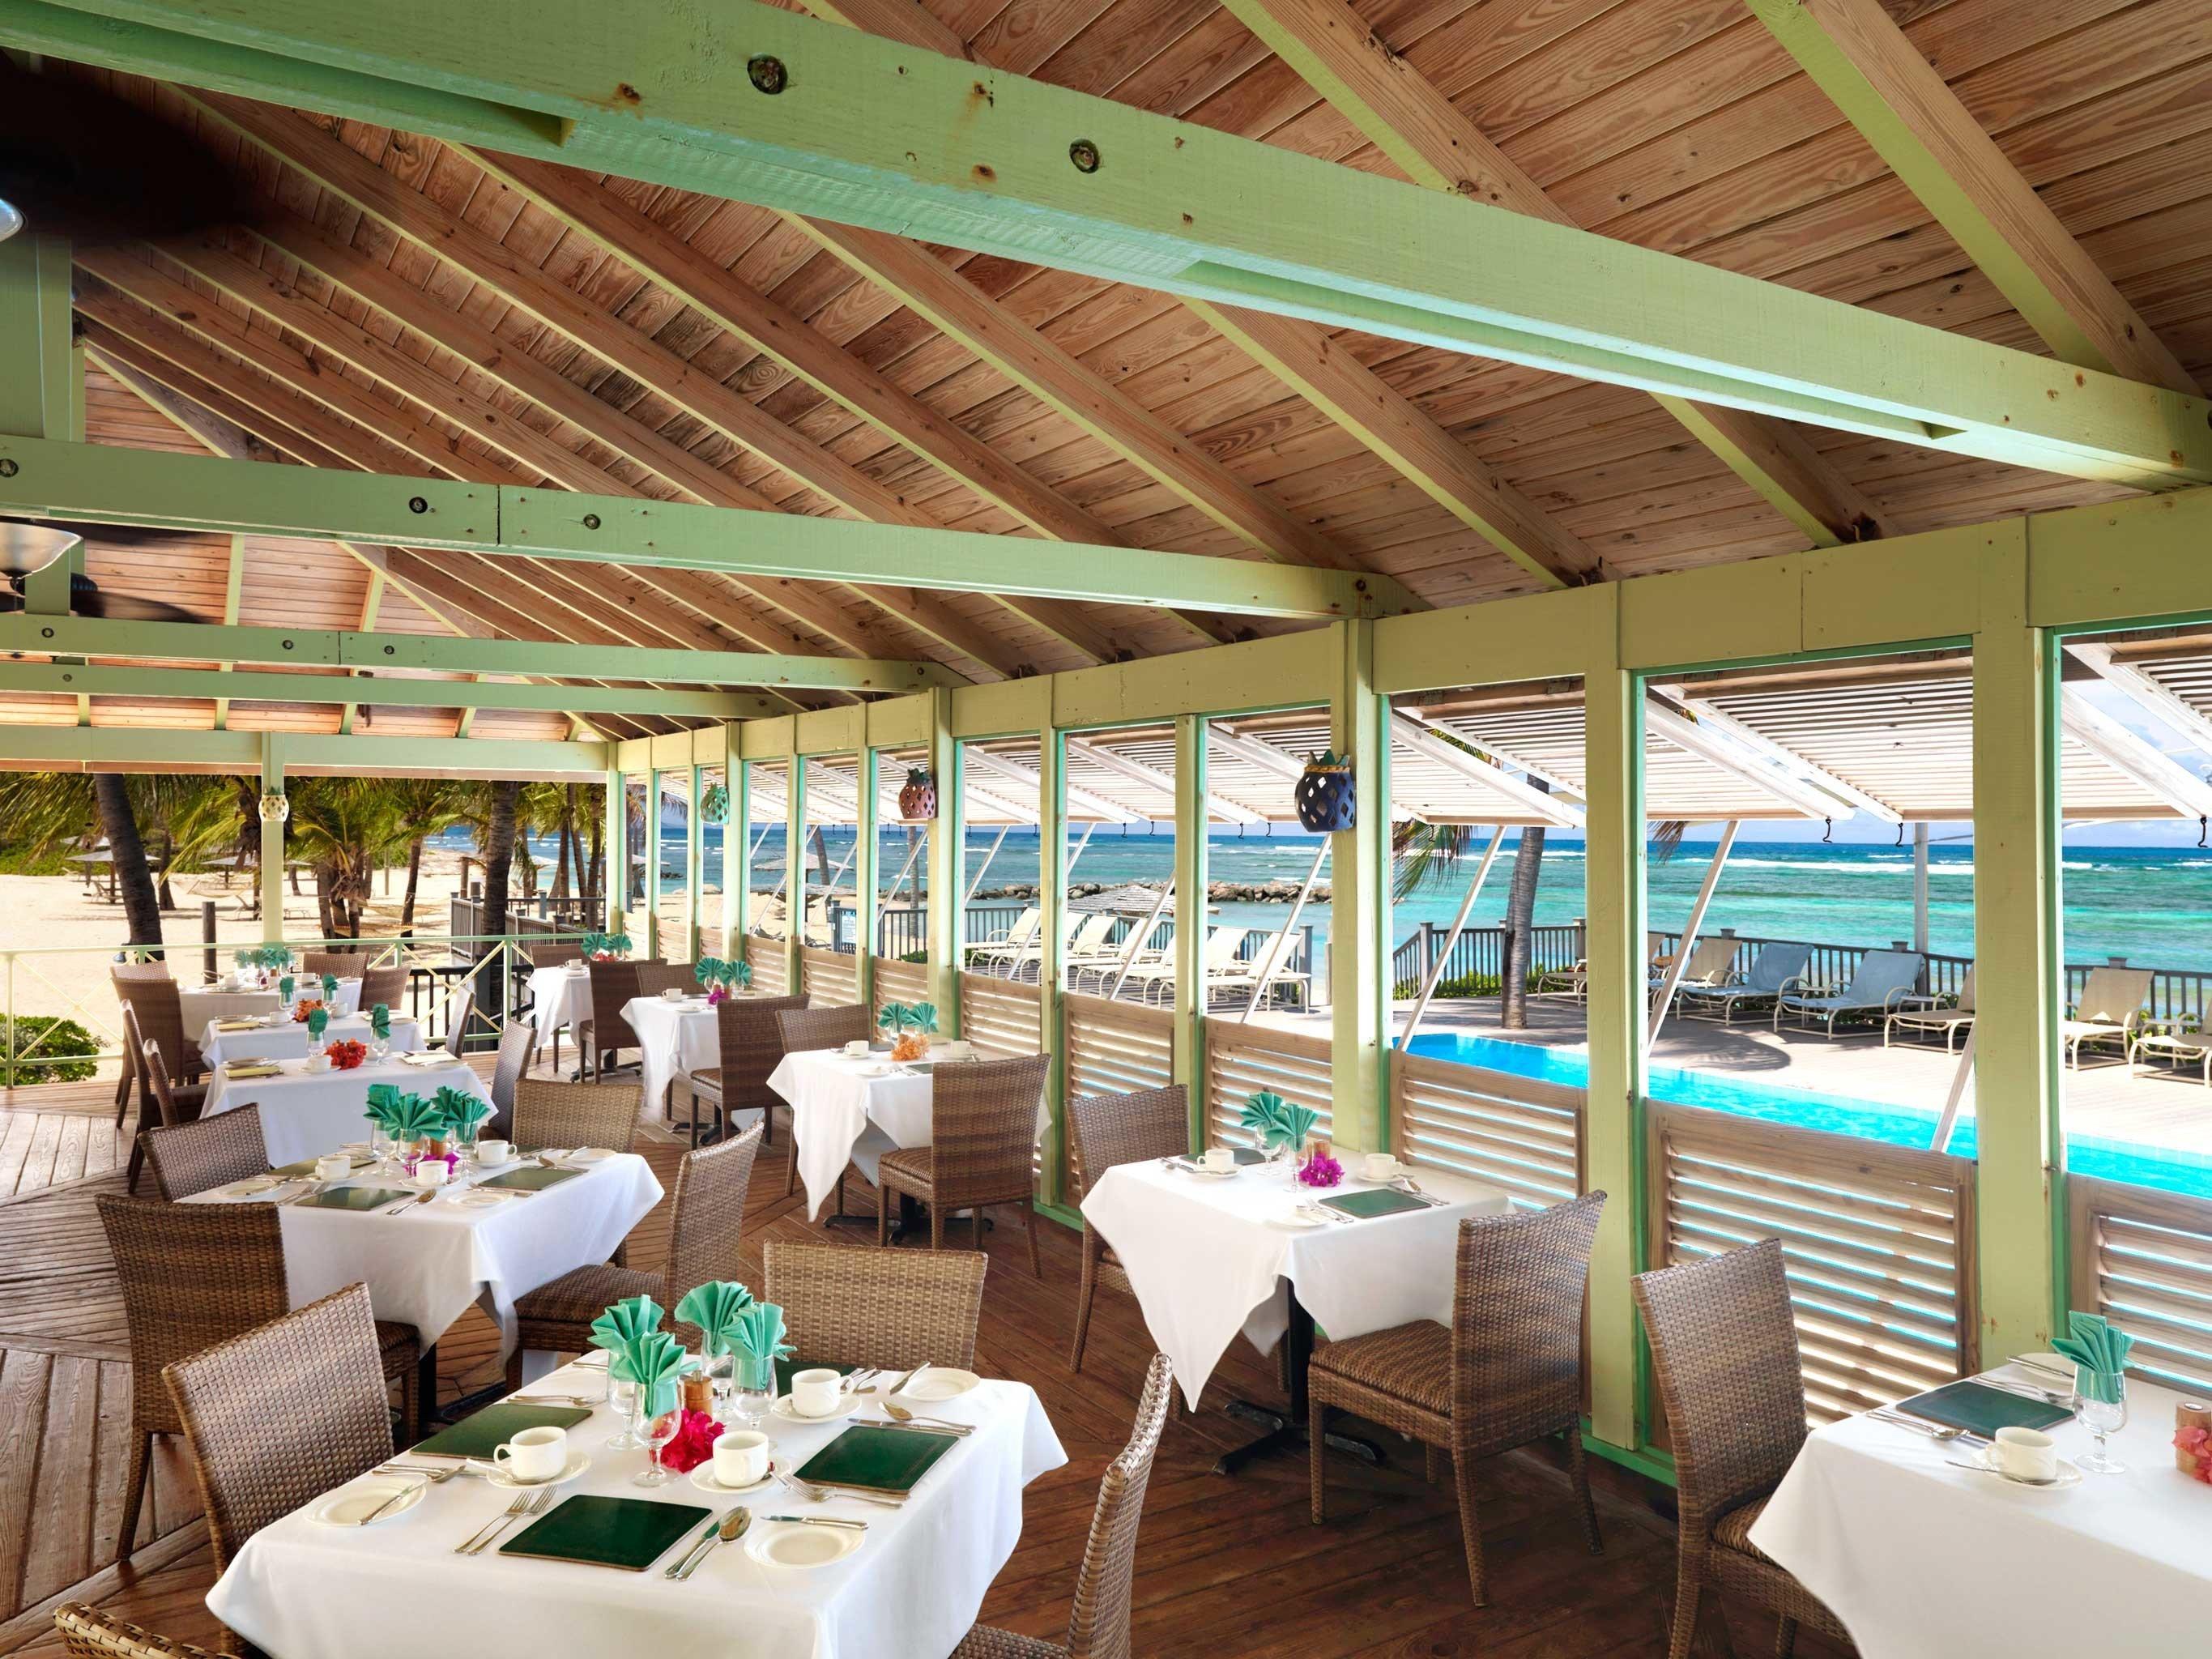 Bar Beach Beachfront Dining Drink Eat Islands Luxury Luxury Travel Scenic views Trip Ideas ceiling indoor restaurant Resort estate interior design furniture area